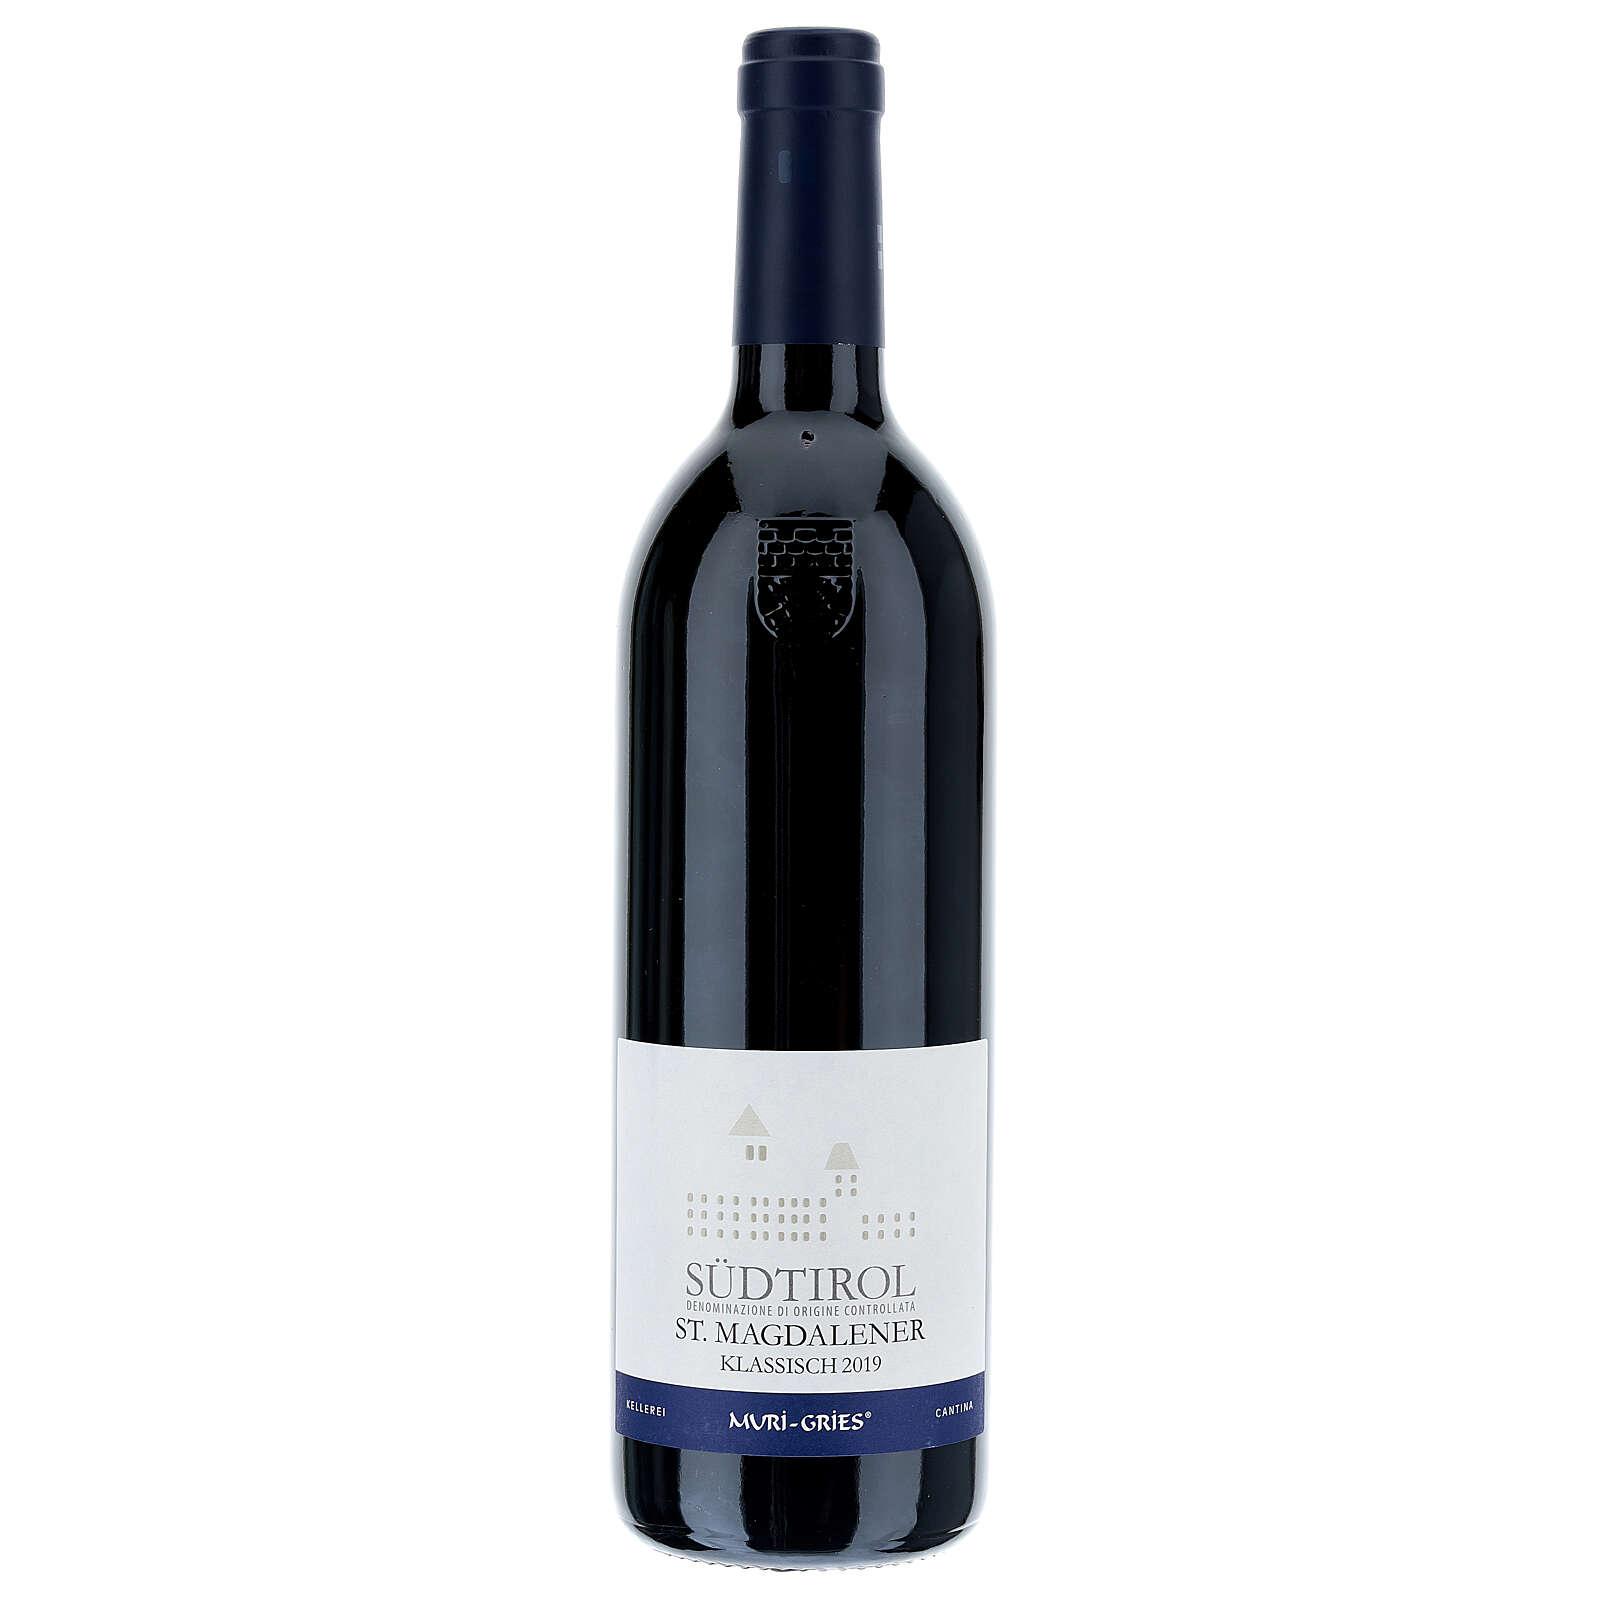 Vinho S. Maddalena DOC 2019 Abadia Muri Gries 750 ml 3